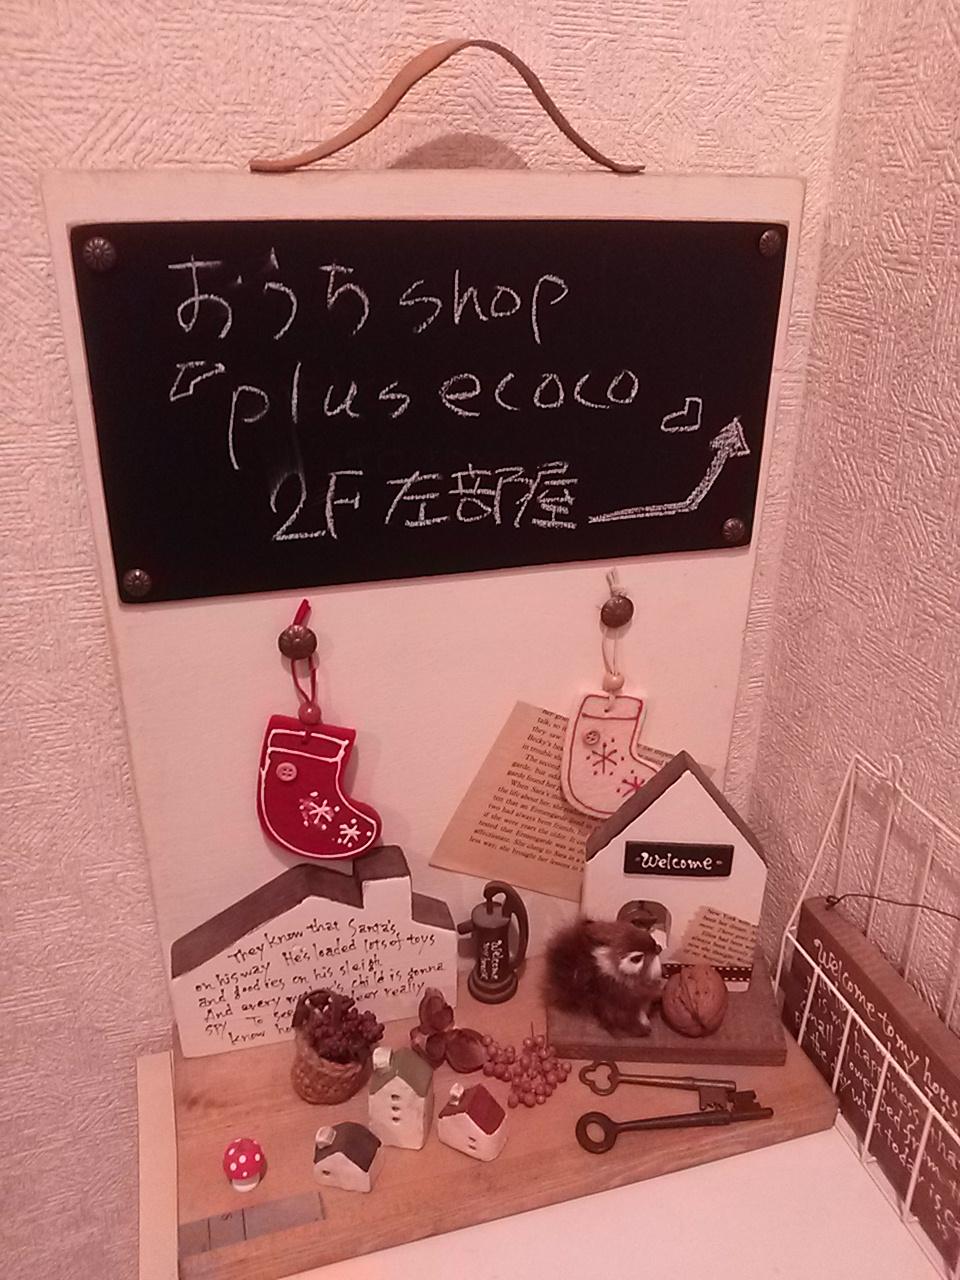 ecoco さんのお店_d0085448_17242853.jpg